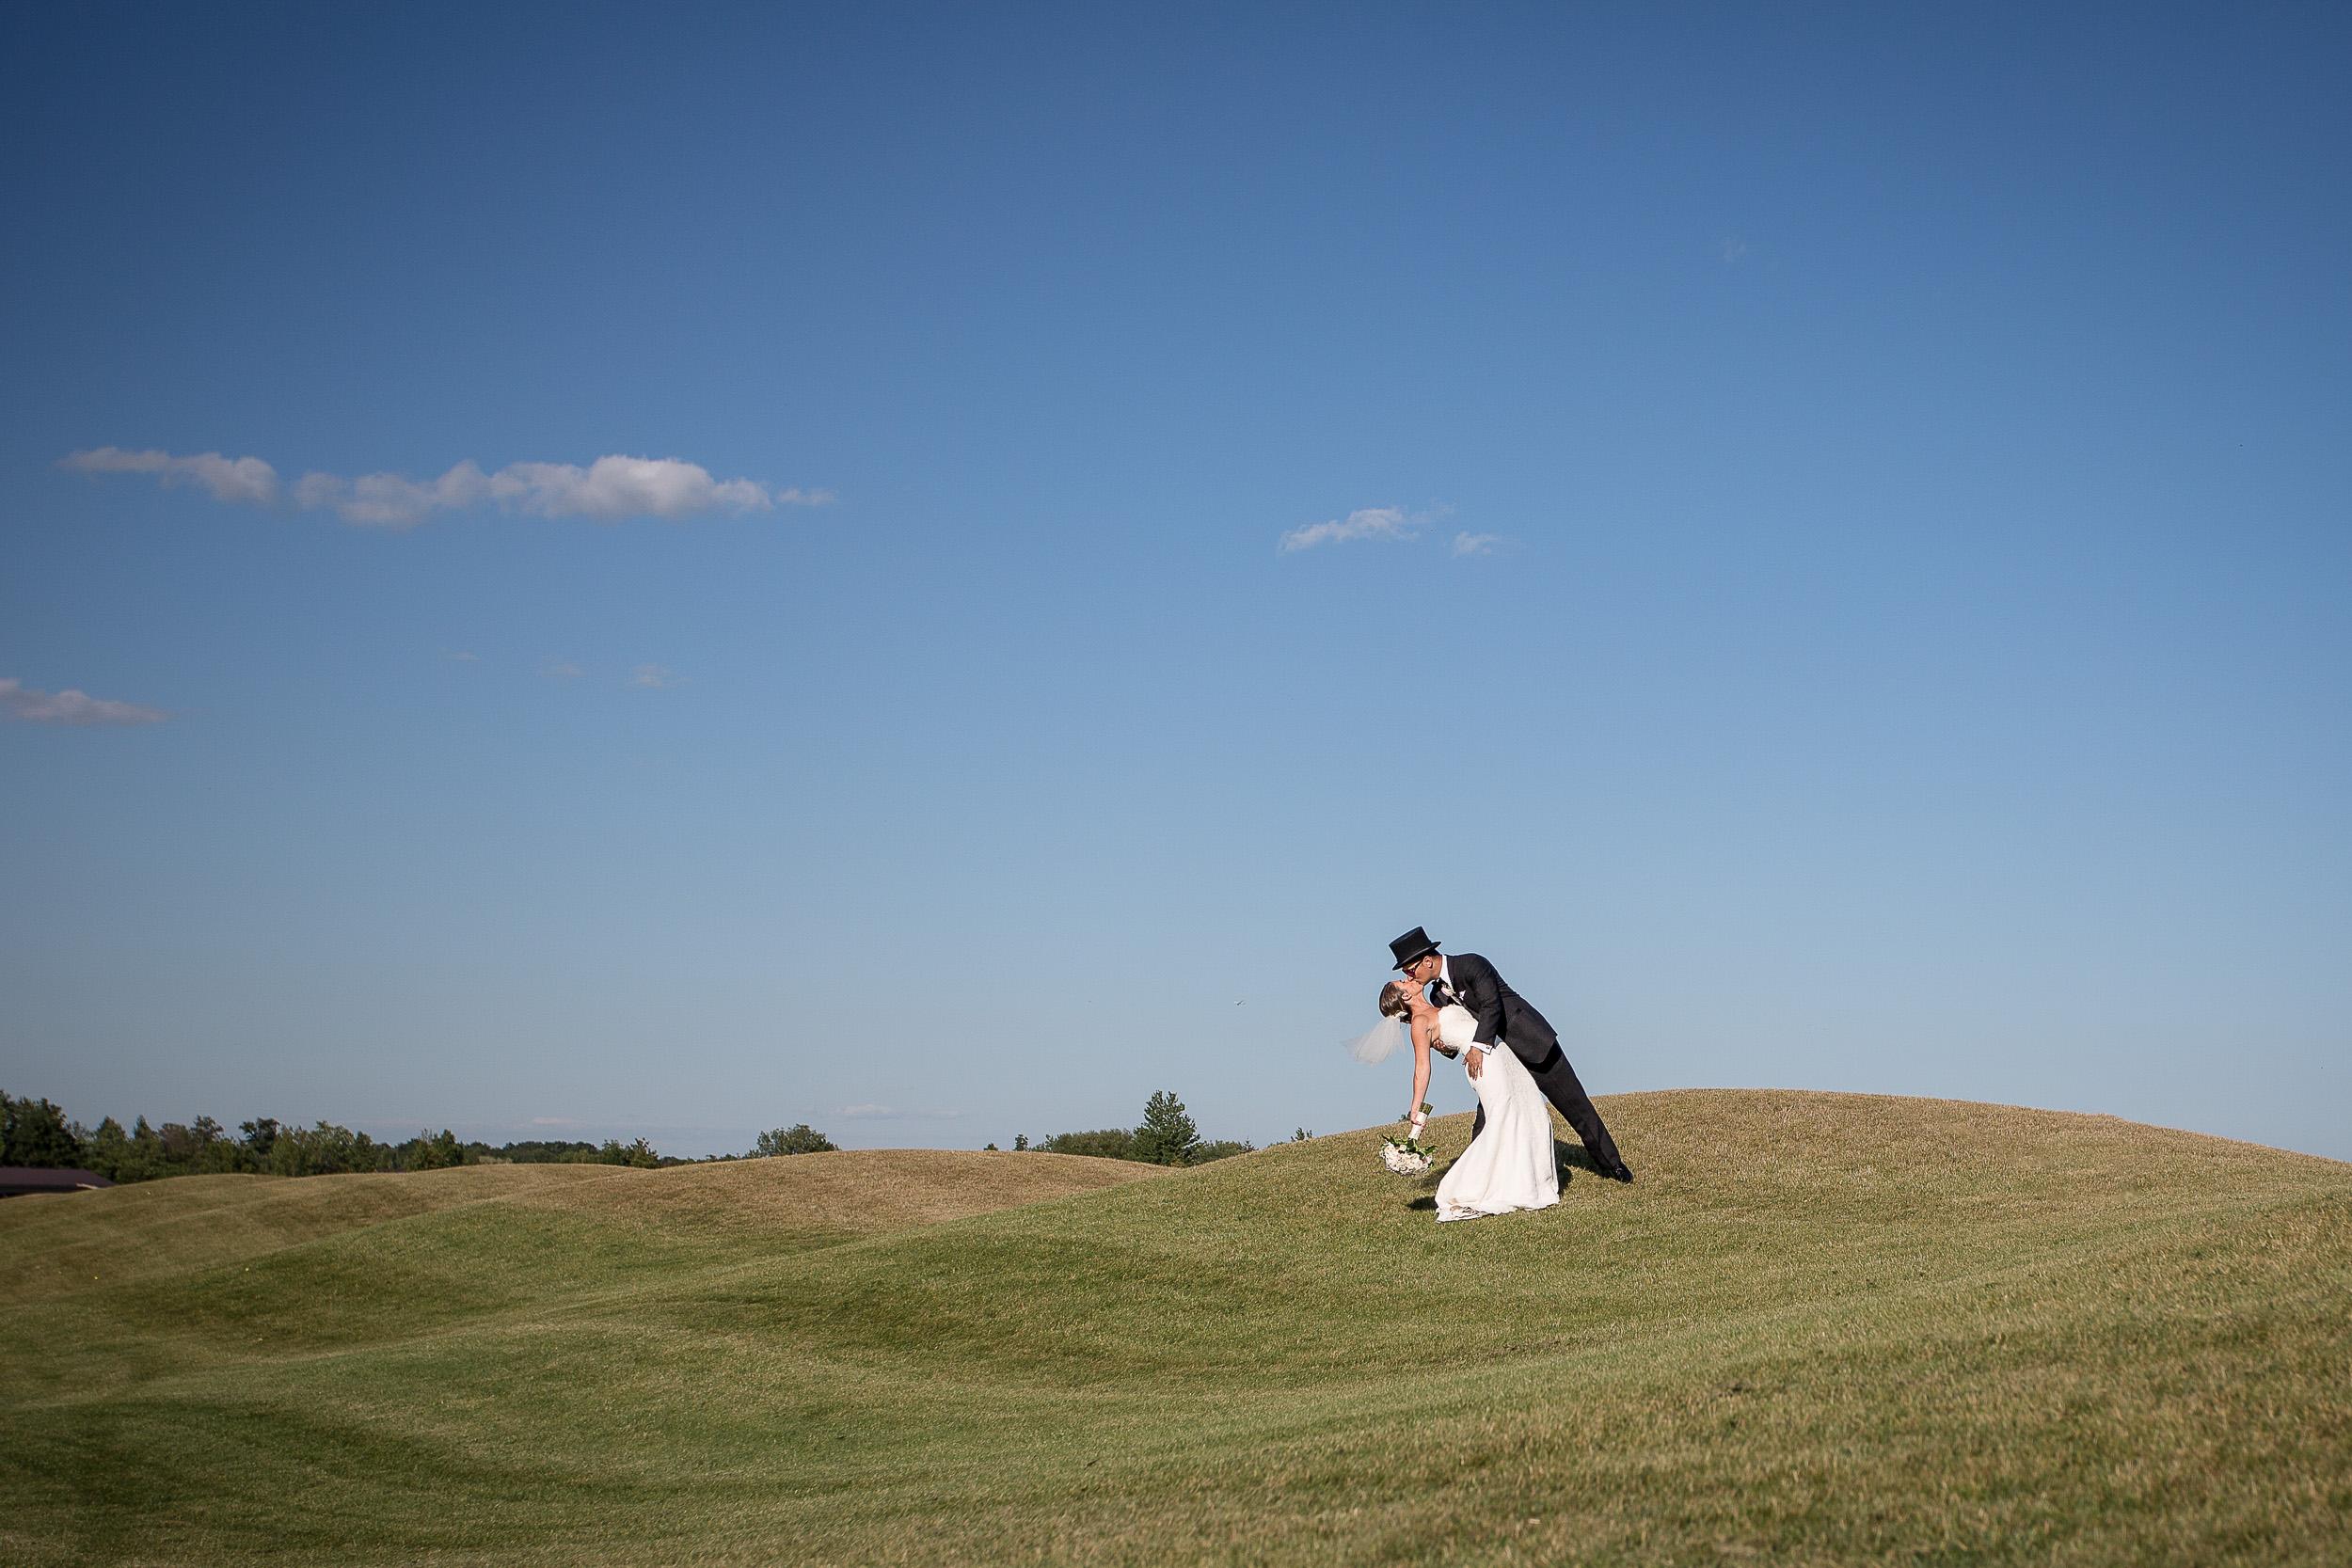 FumioWeddings - Real Weddings mixed-34.jpg